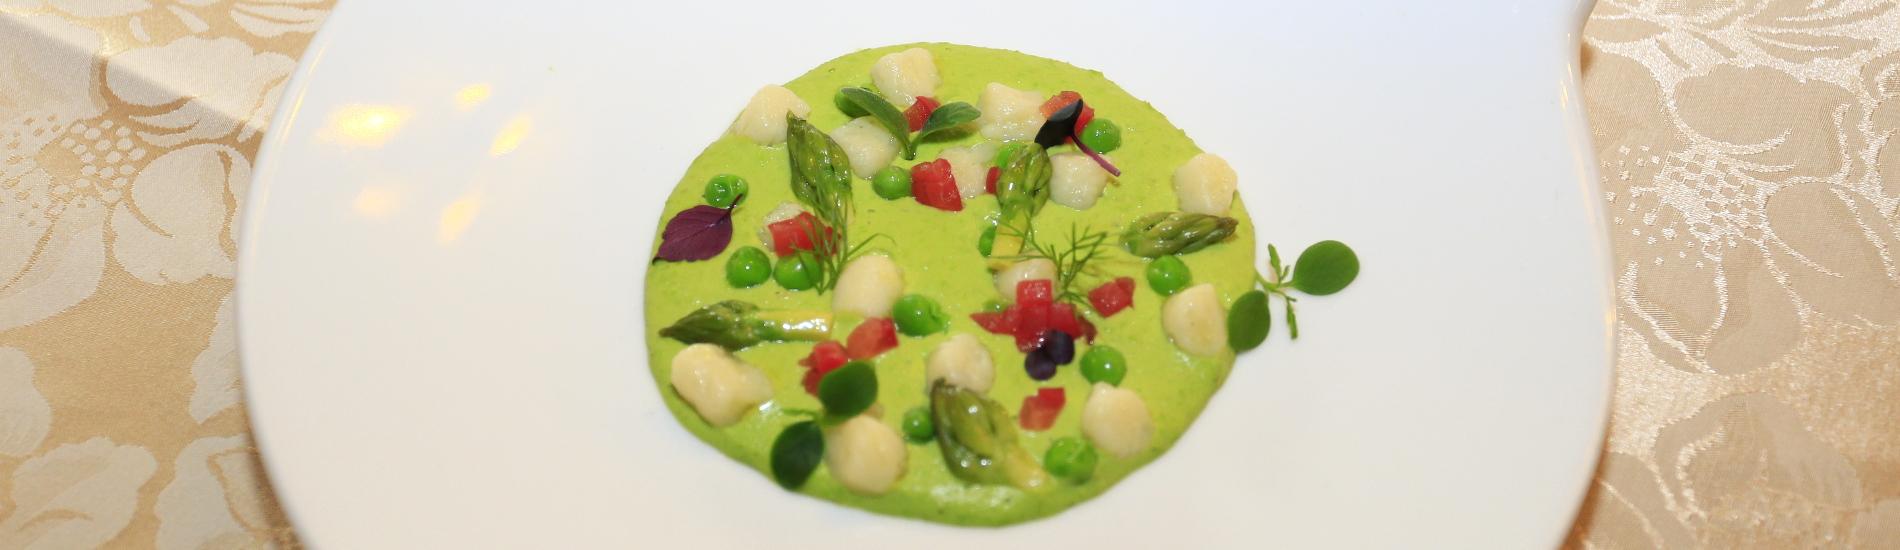 Hotel in Trentino con Cucina Vegetariana